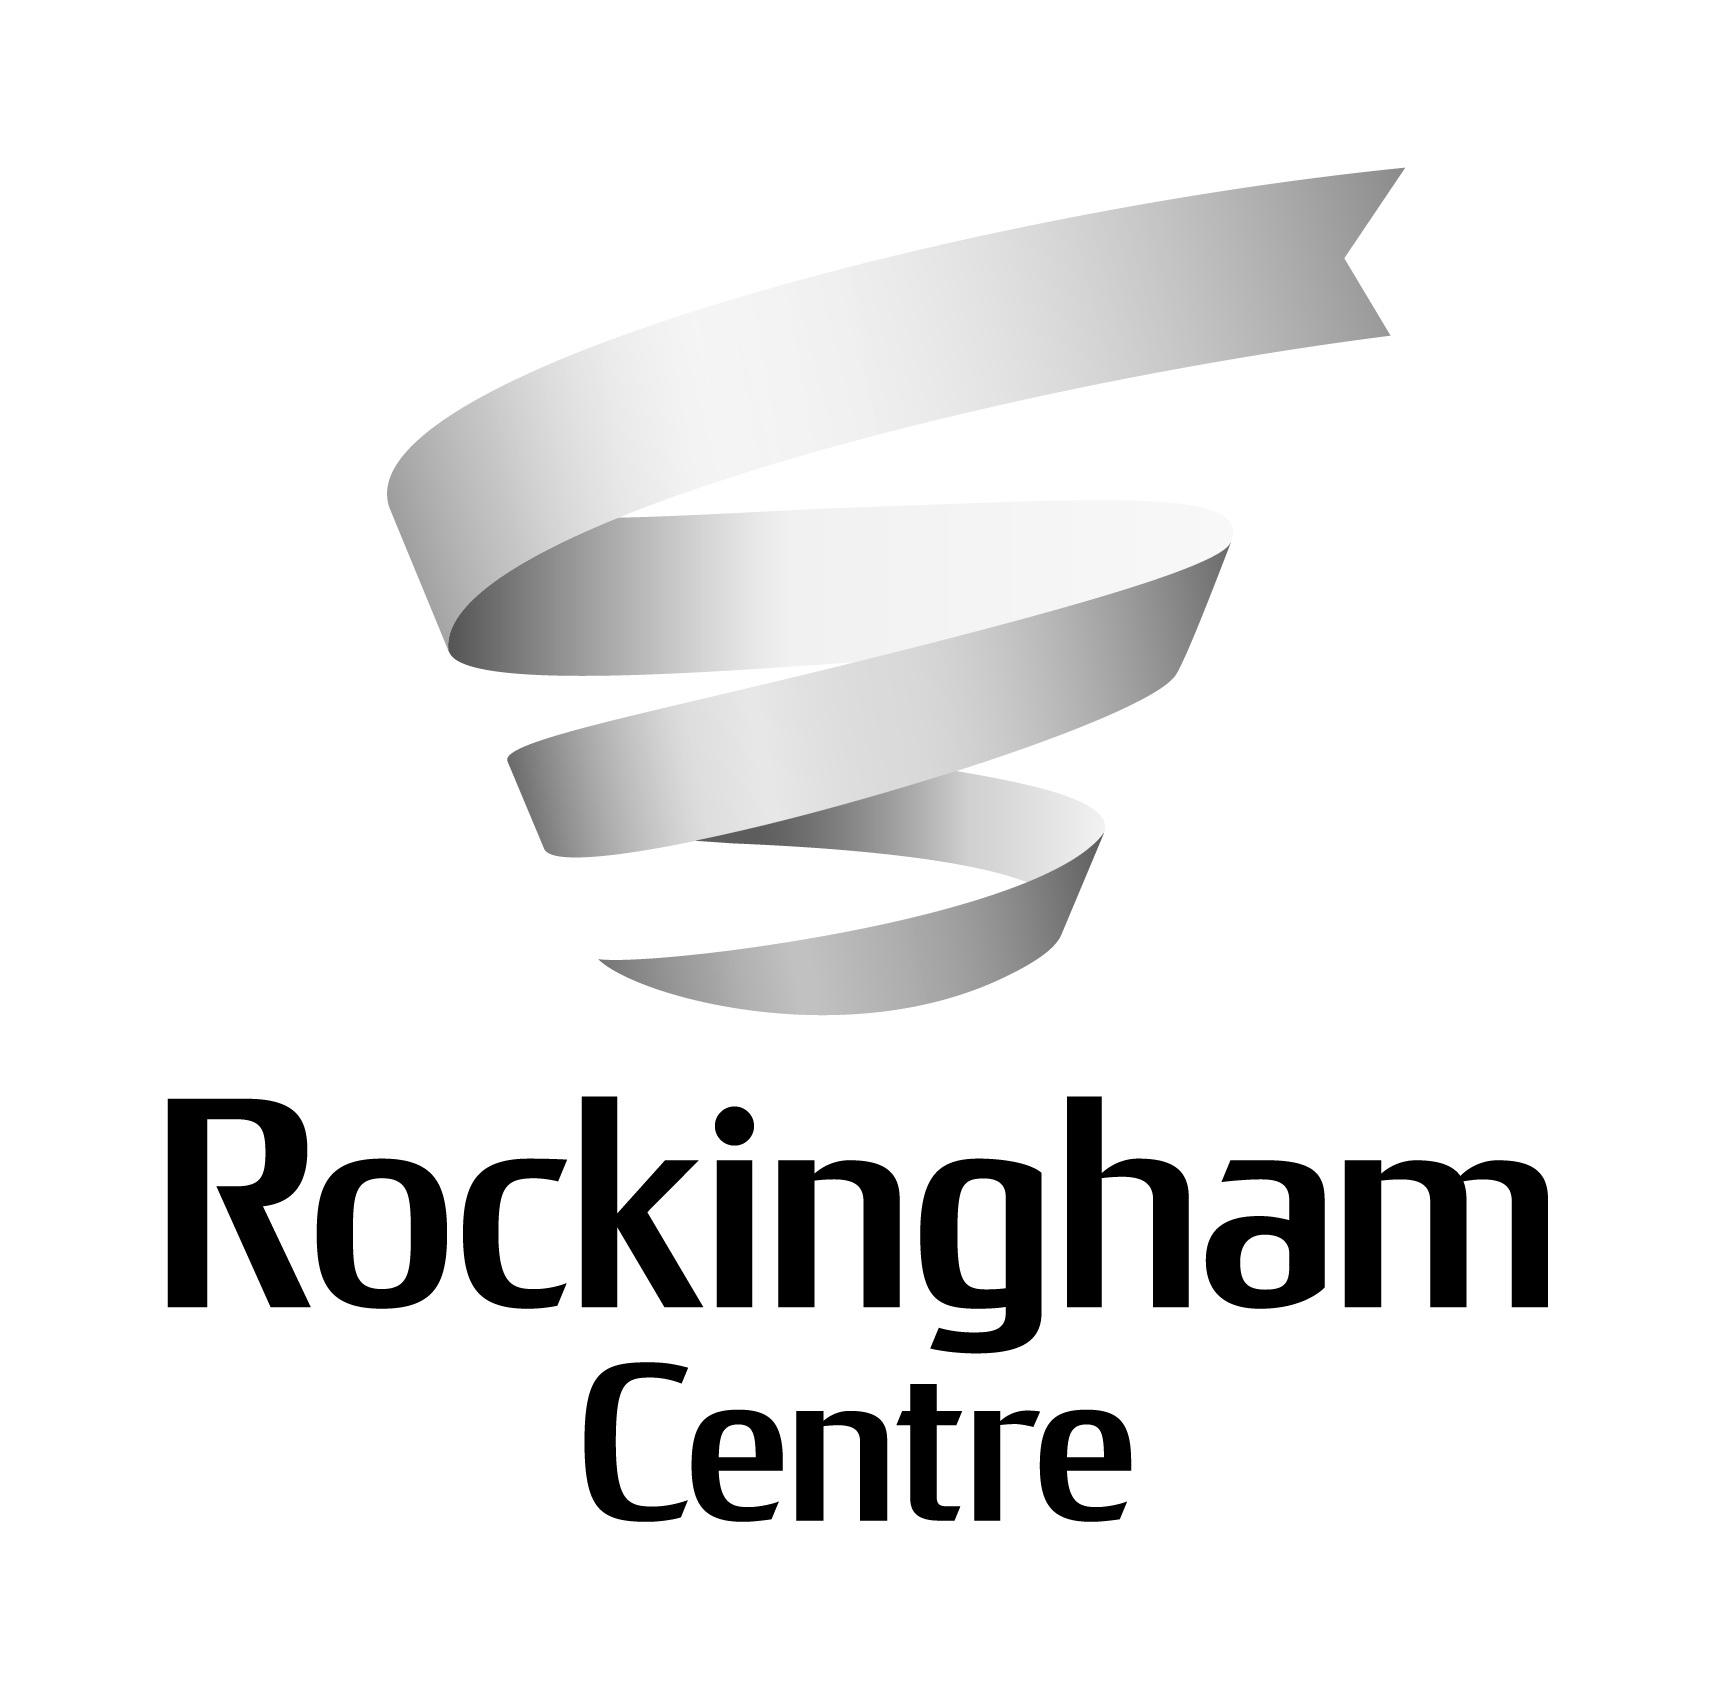 VIC_Rockingham Centre_POS_V_RGB-2015.png